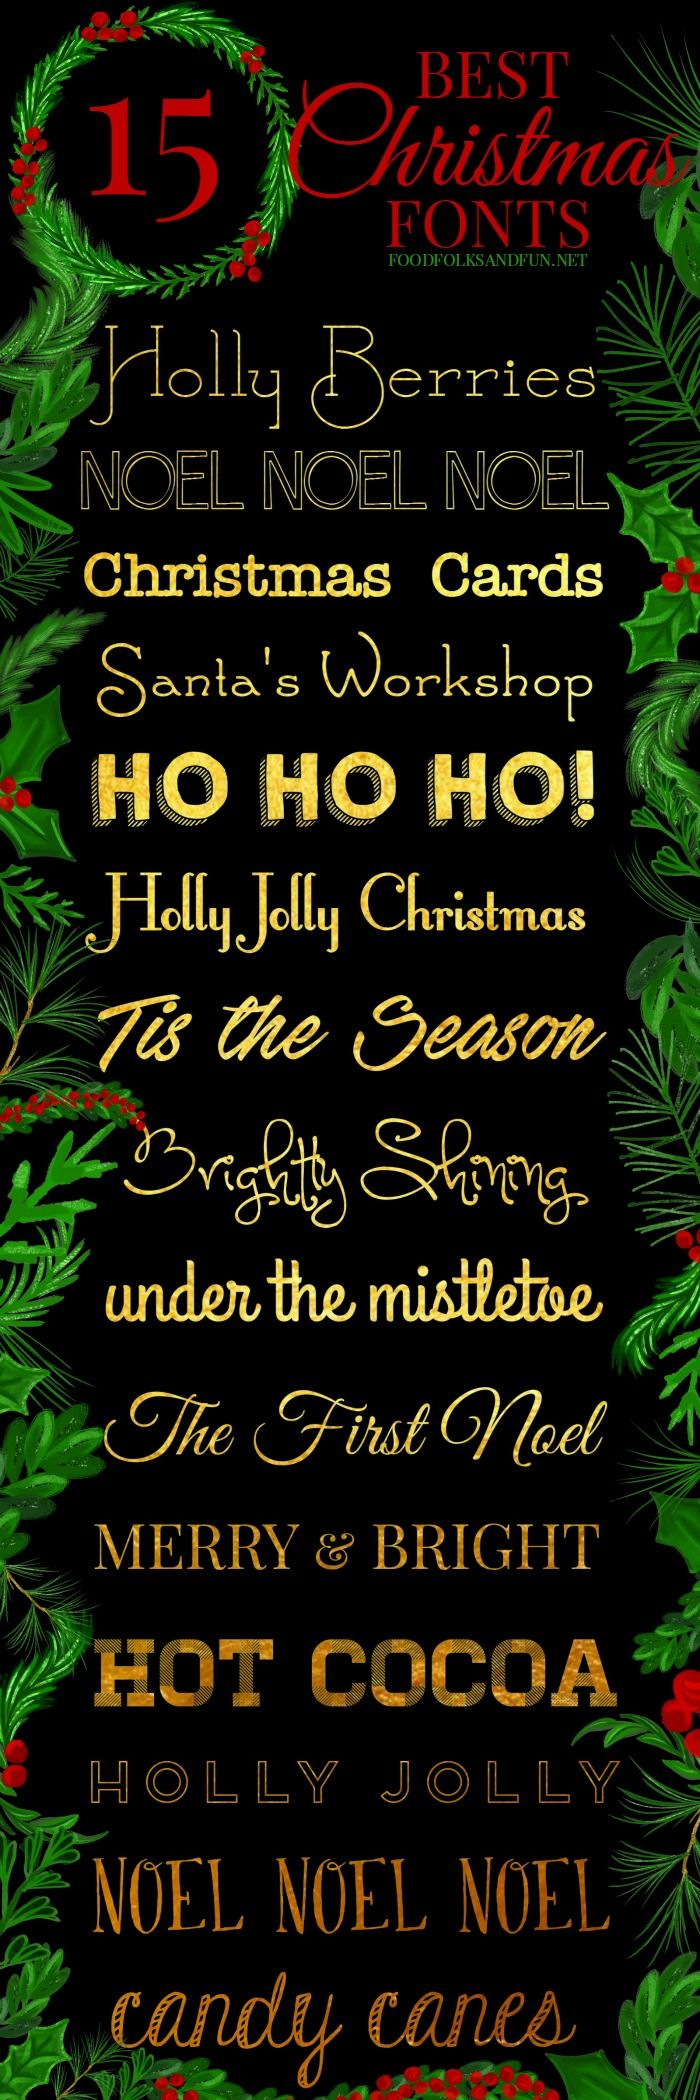 Best 25+ Christmas fonts ideas on Pinterest | Holiday fonts, Best ...